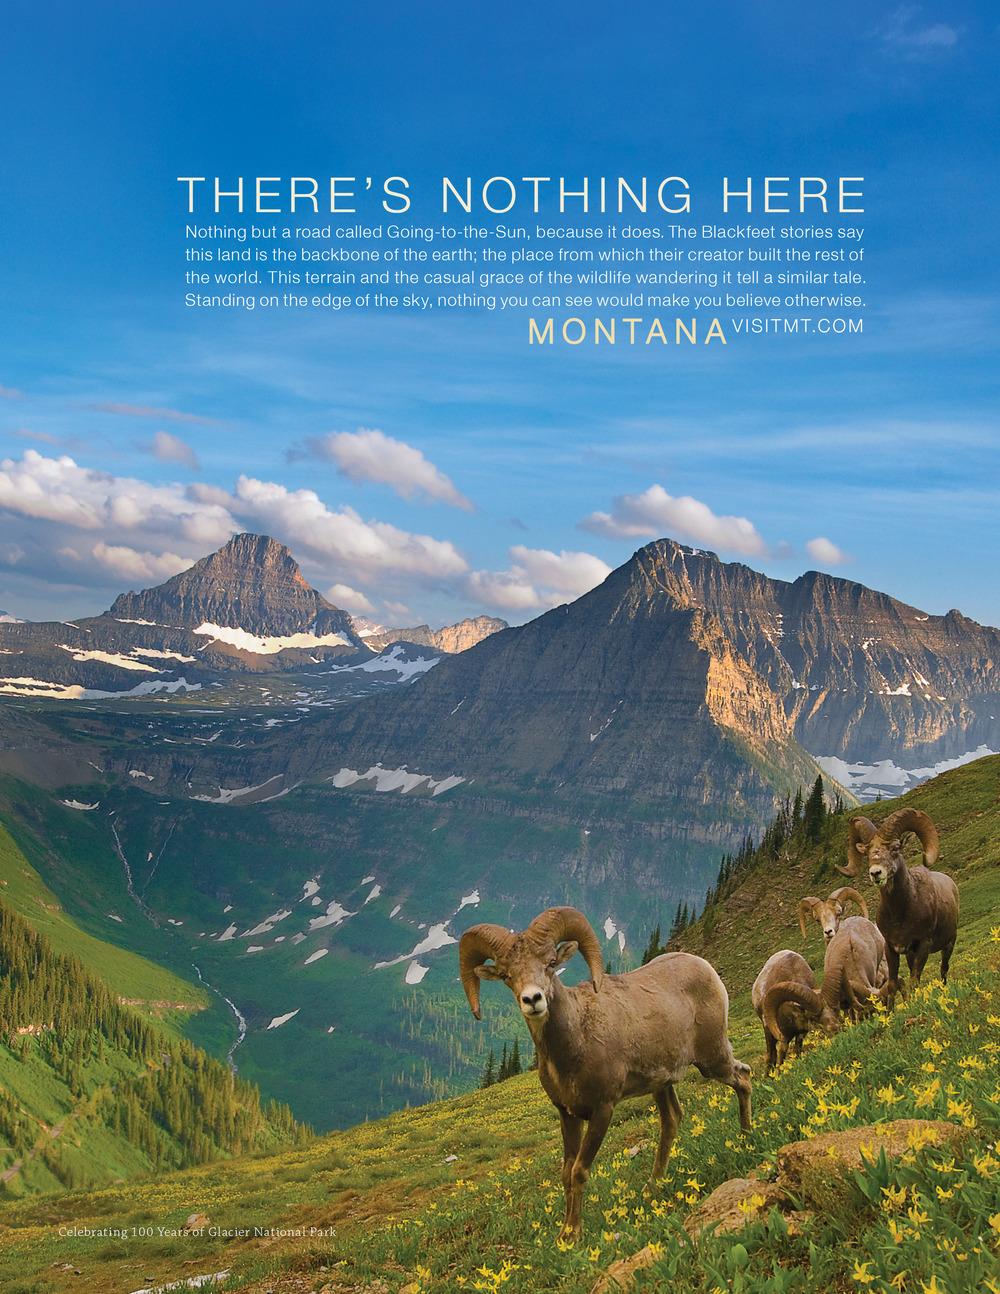 Montana has nothing